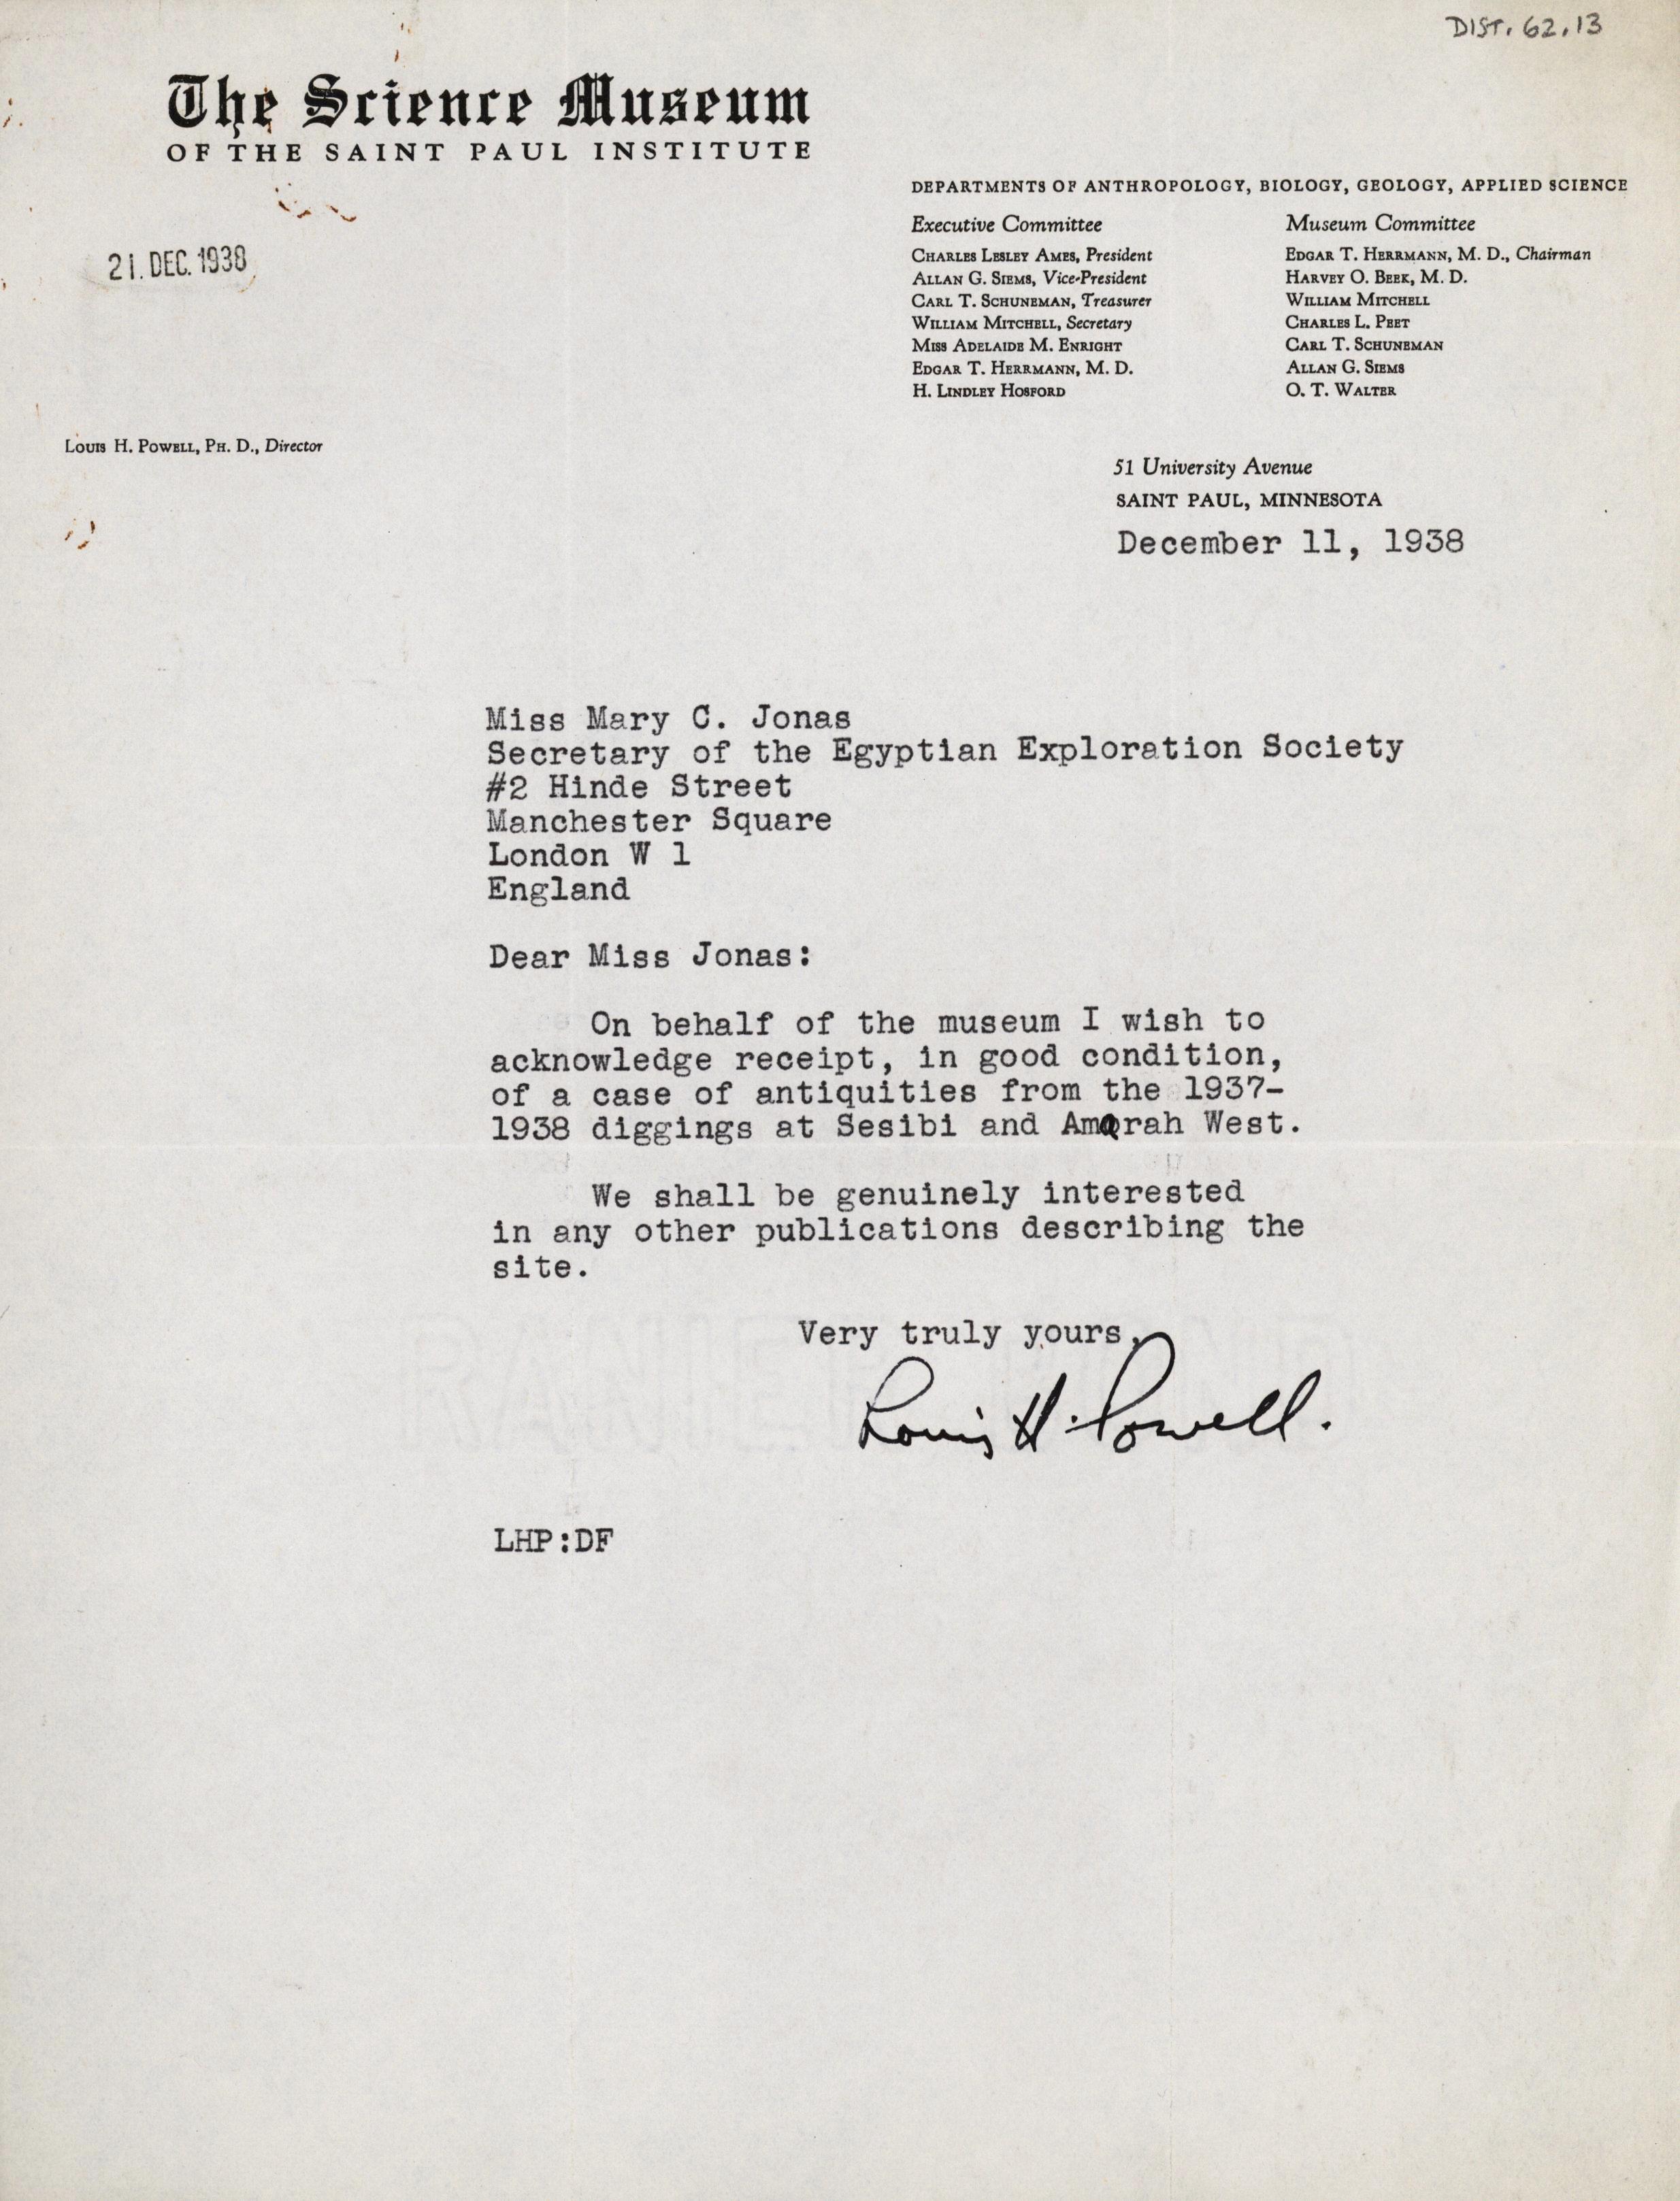 1936-38 Amarah West, Sesebi DIST.62.13